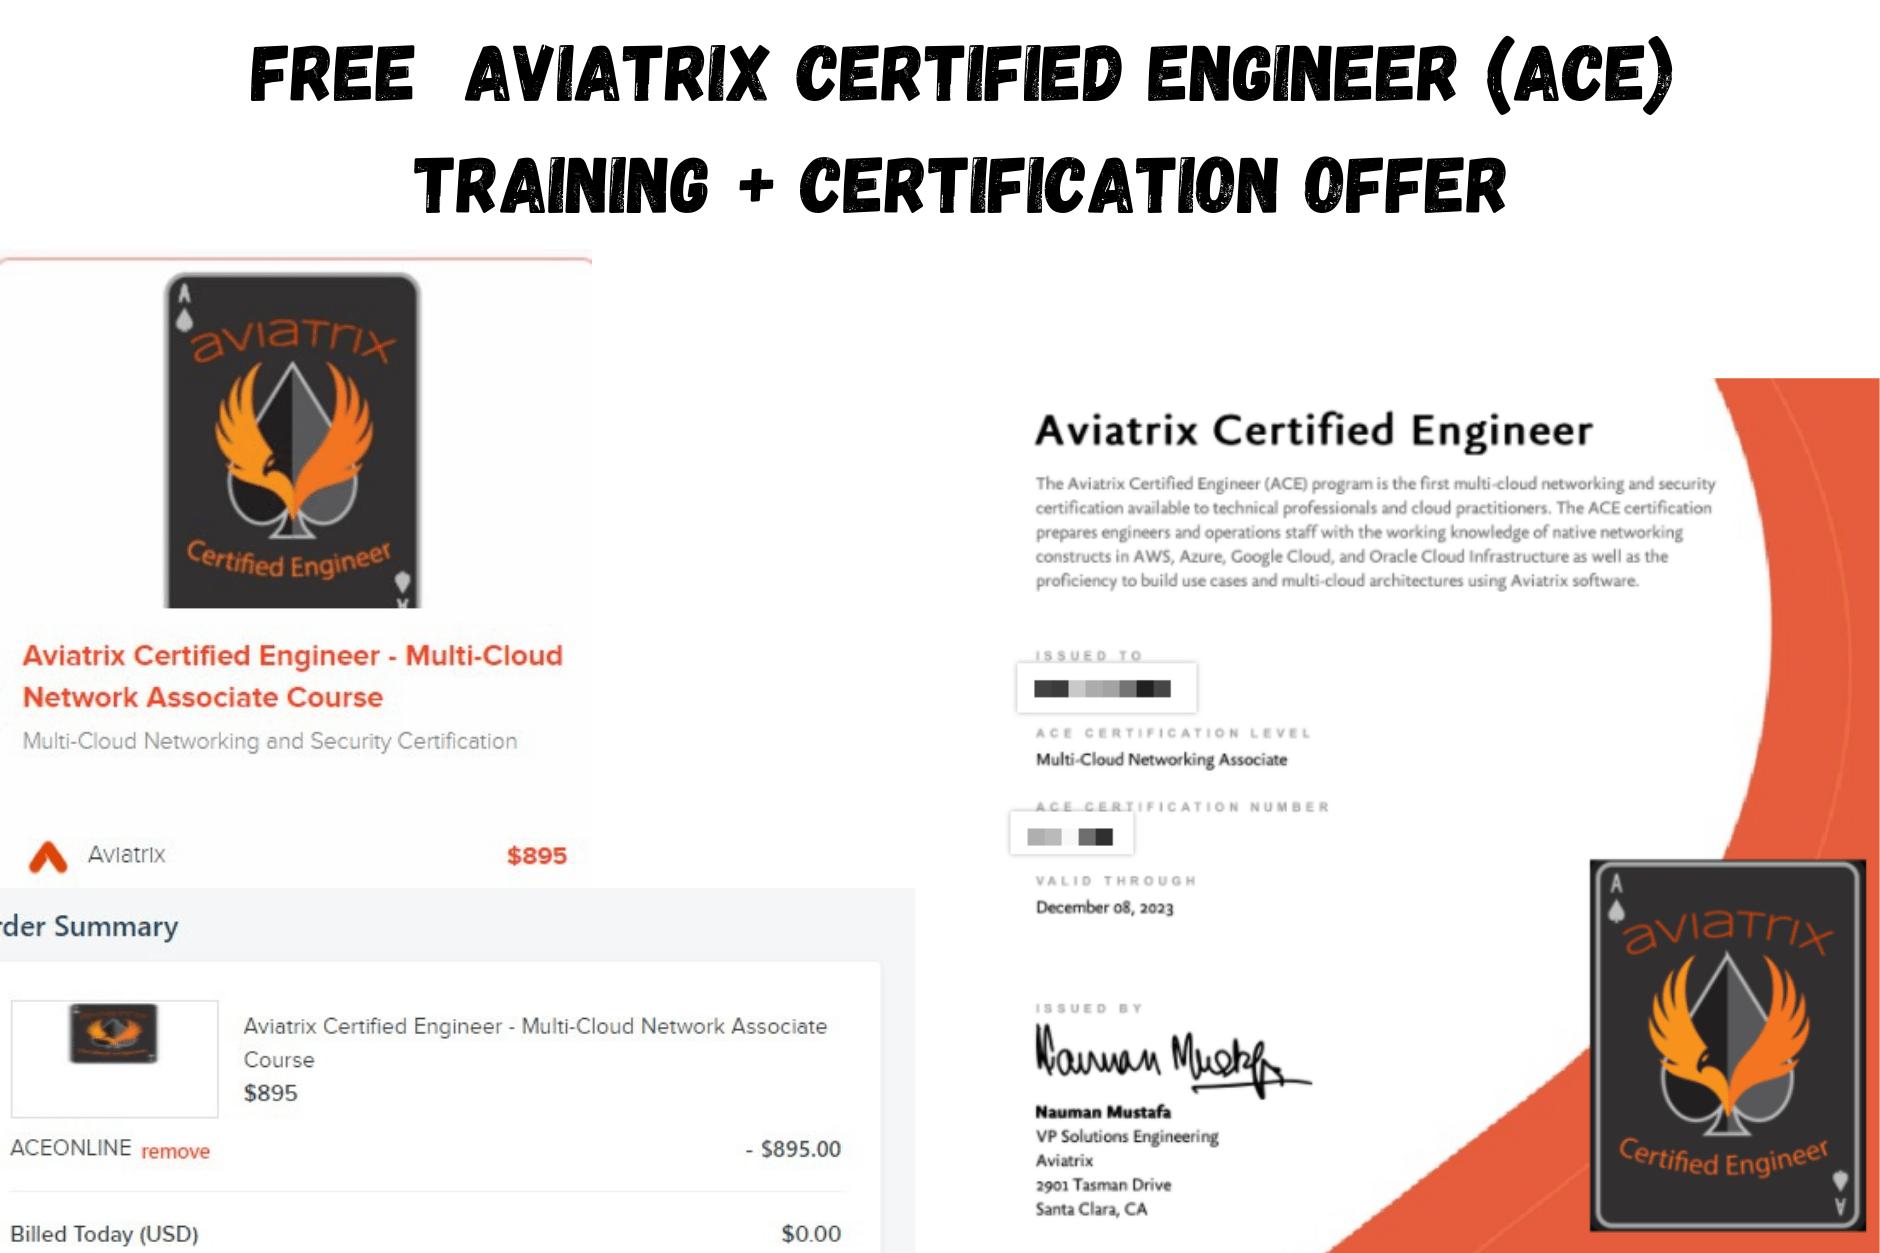 certification offer training aviatrix engineer ace certified till